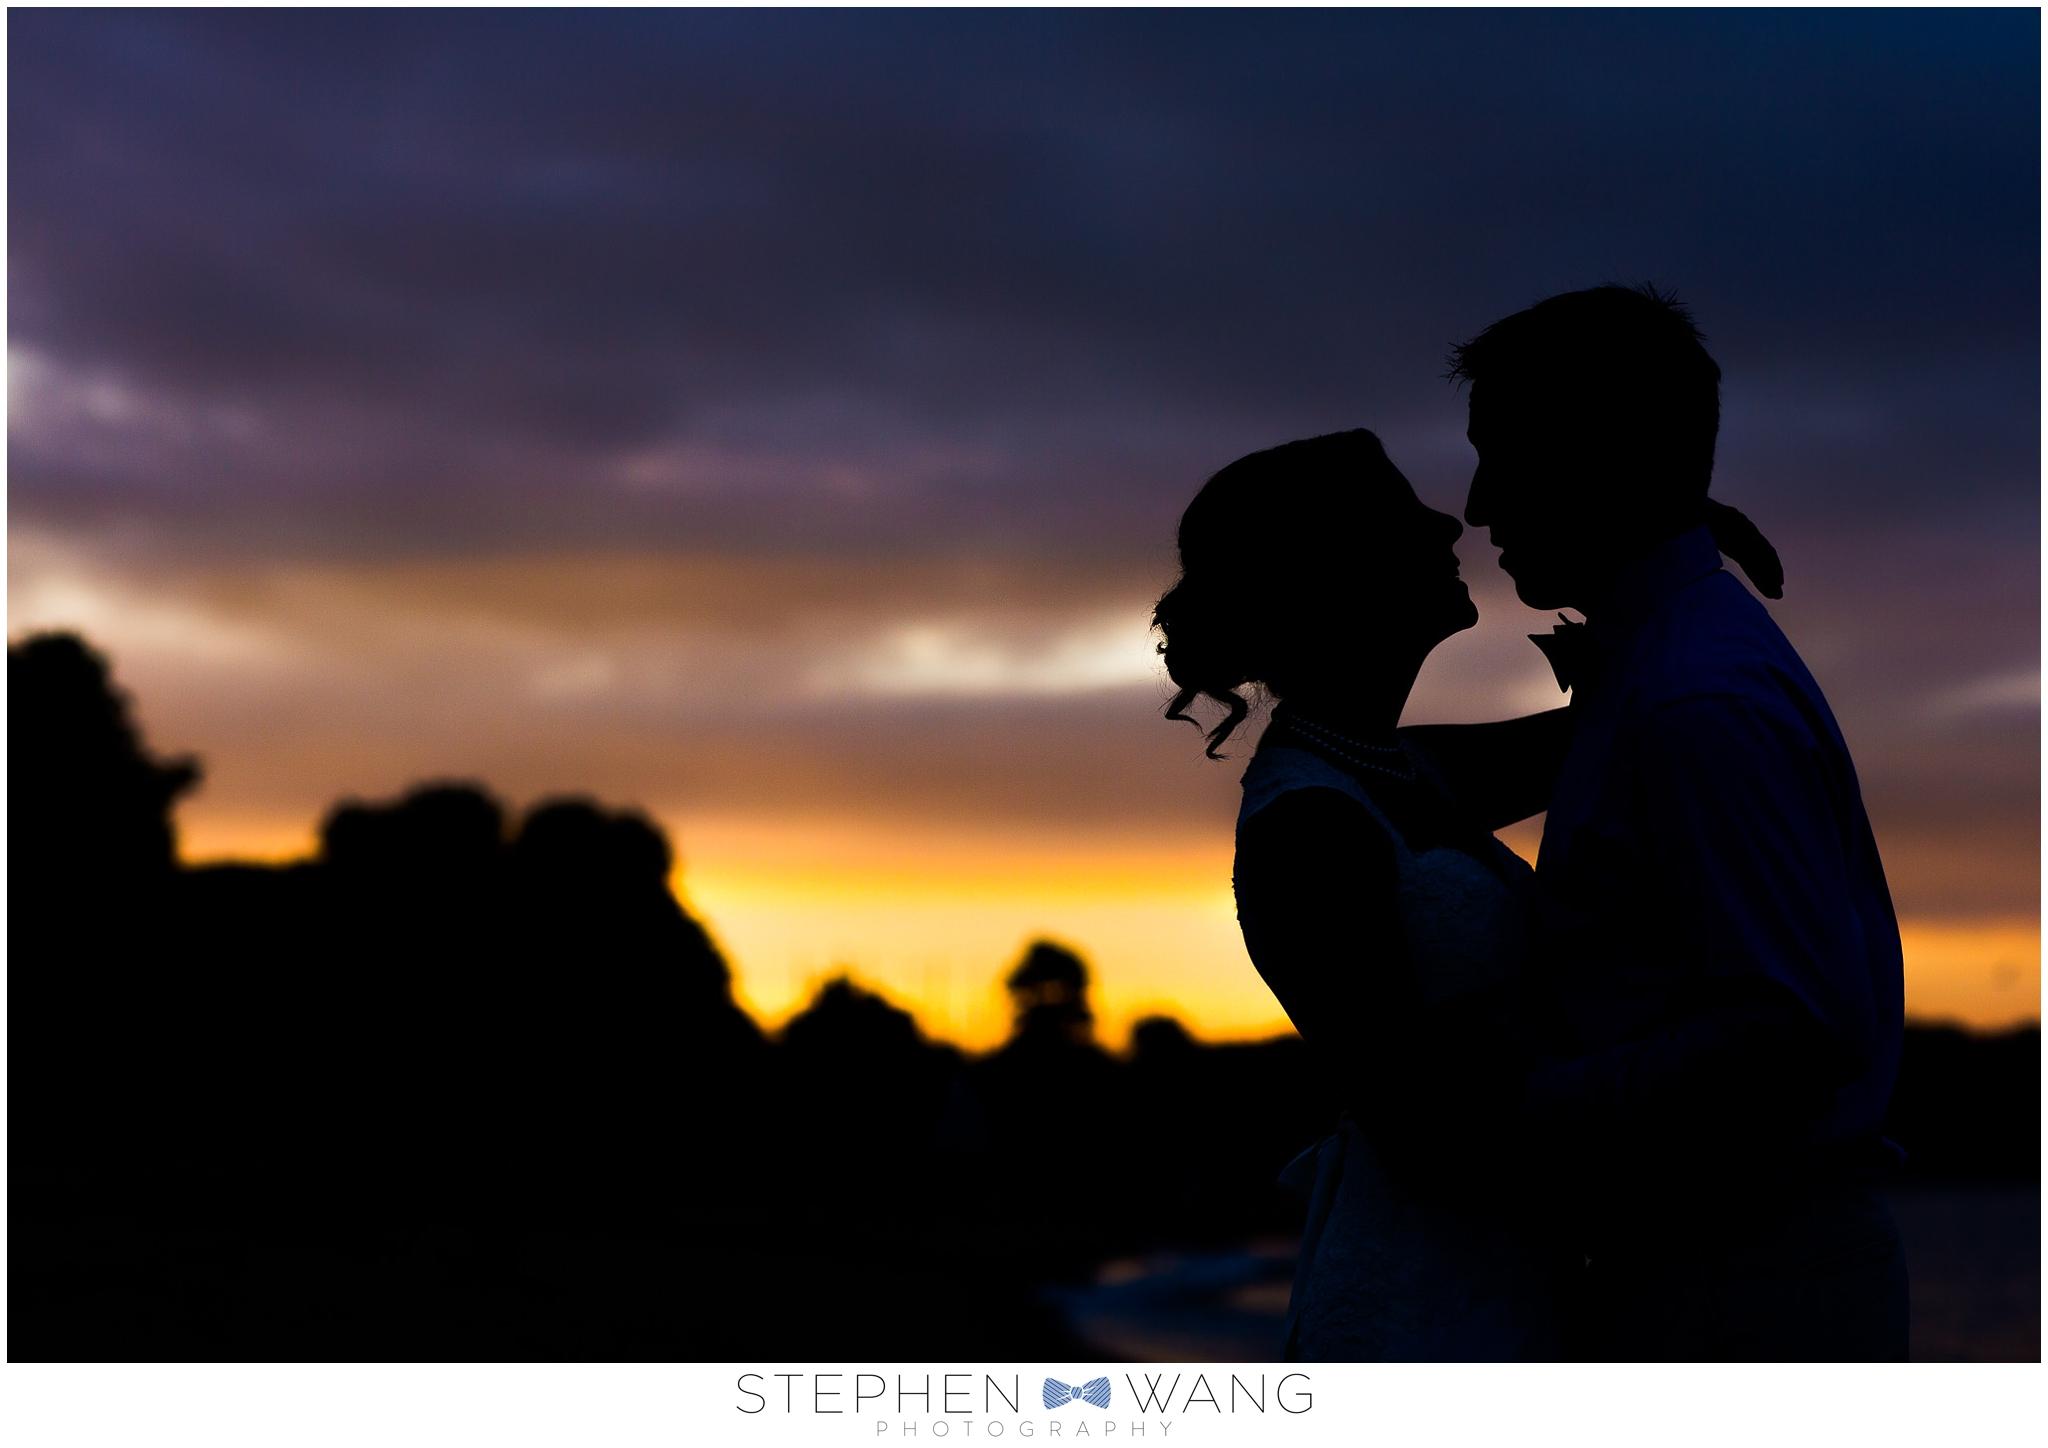 Stephen Wang Photography Madison Surf Club Wedding Photogrpahy CT Connecticut Shoreline Beach Summer Sunset -08-12_0030.jpg